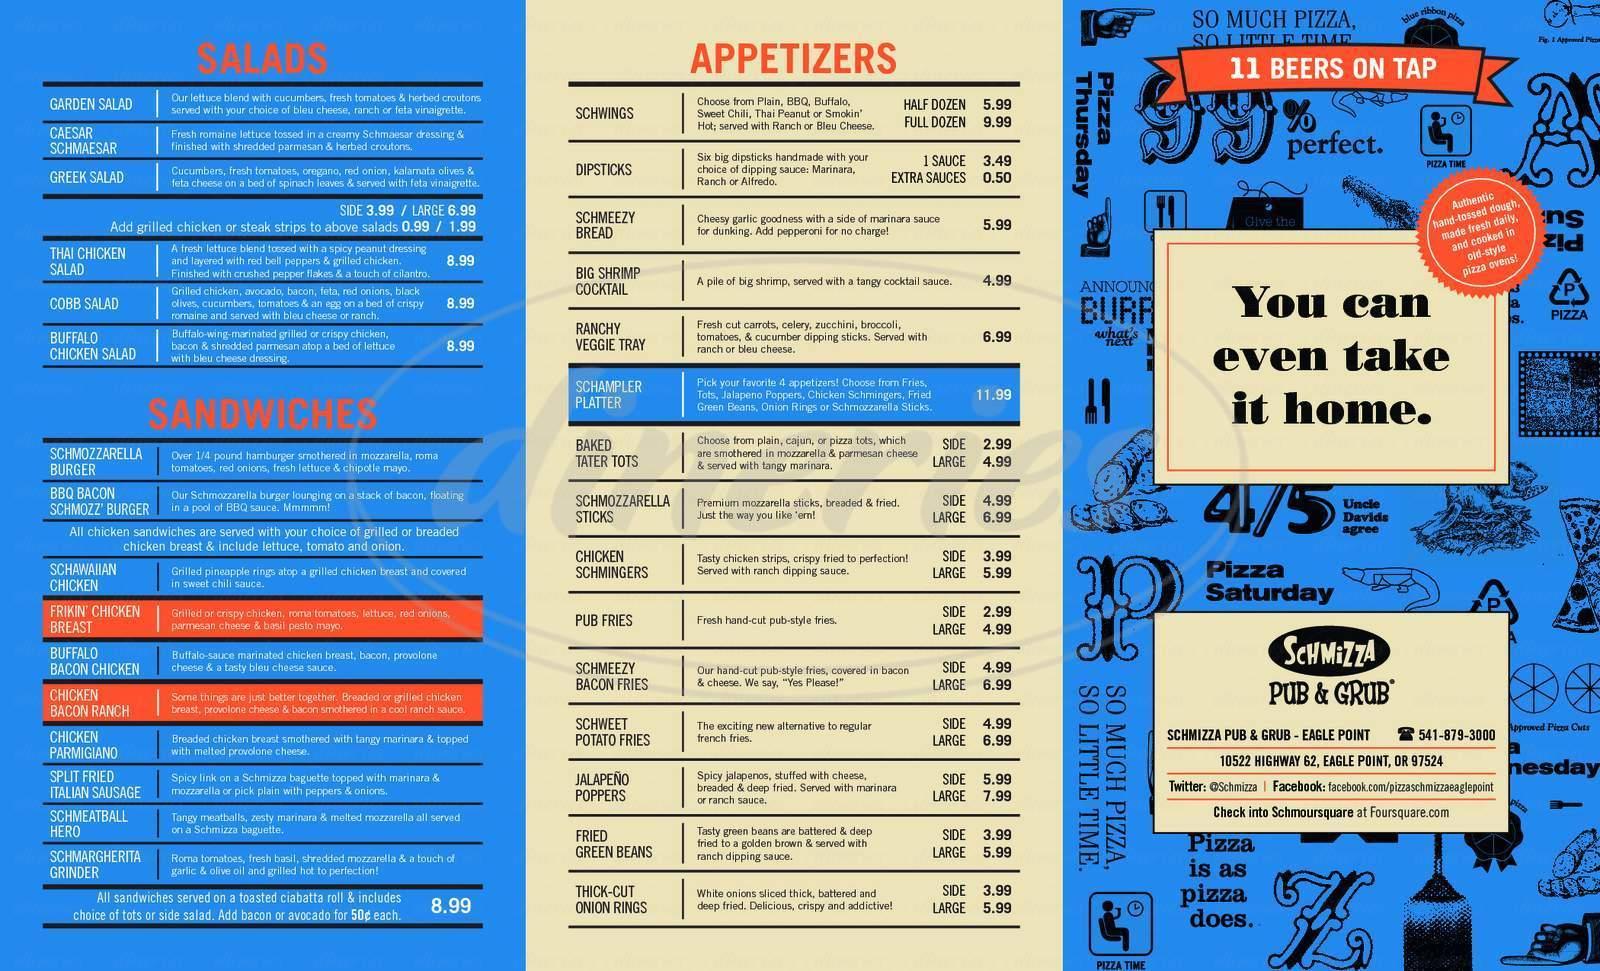 menu for Schmizza Pub & Grub